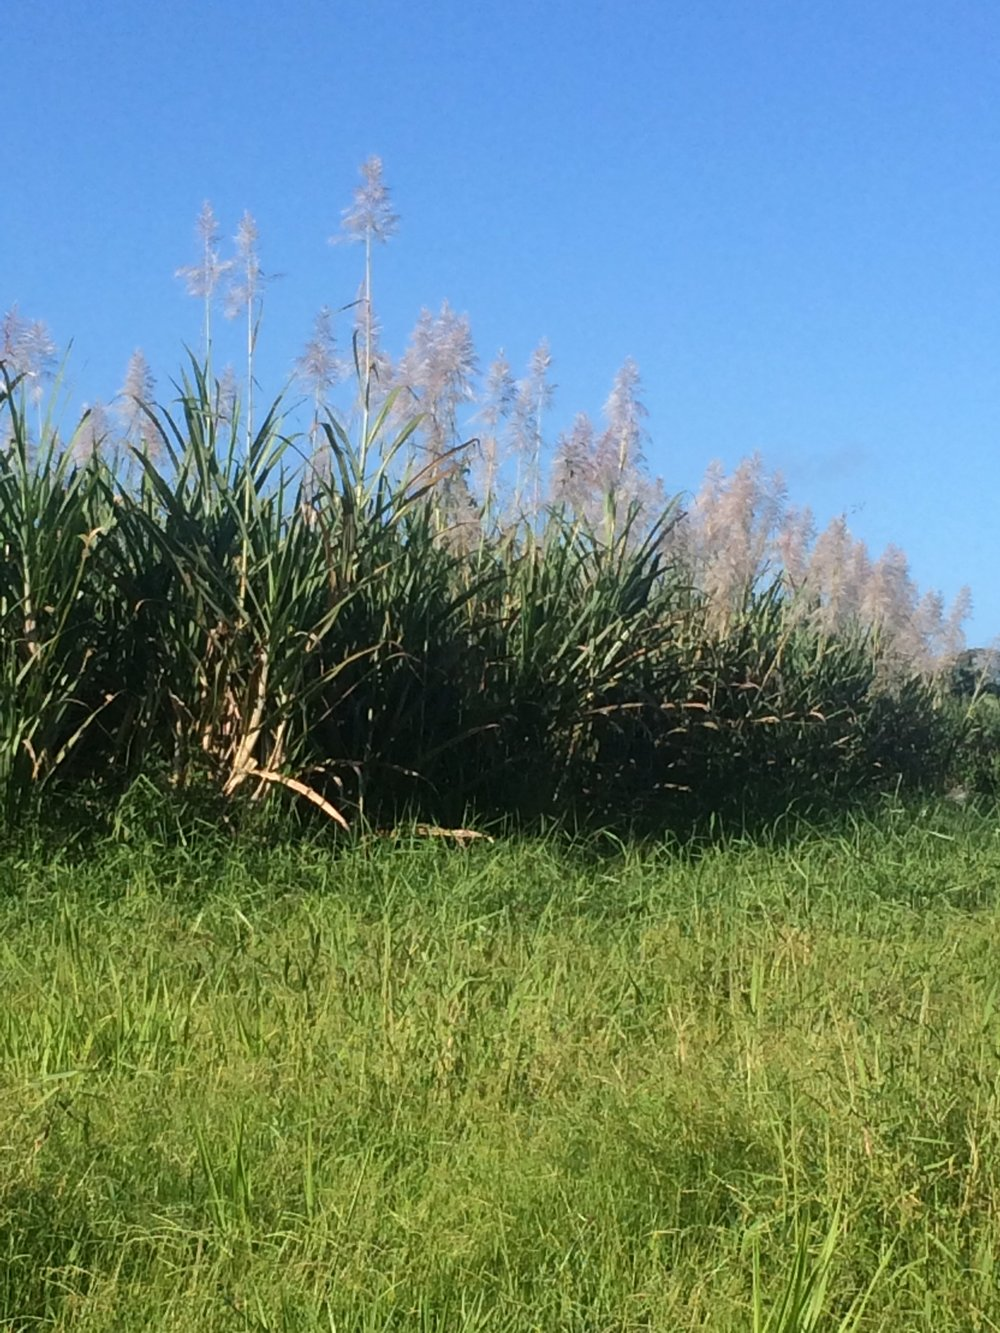 cane field.JPG